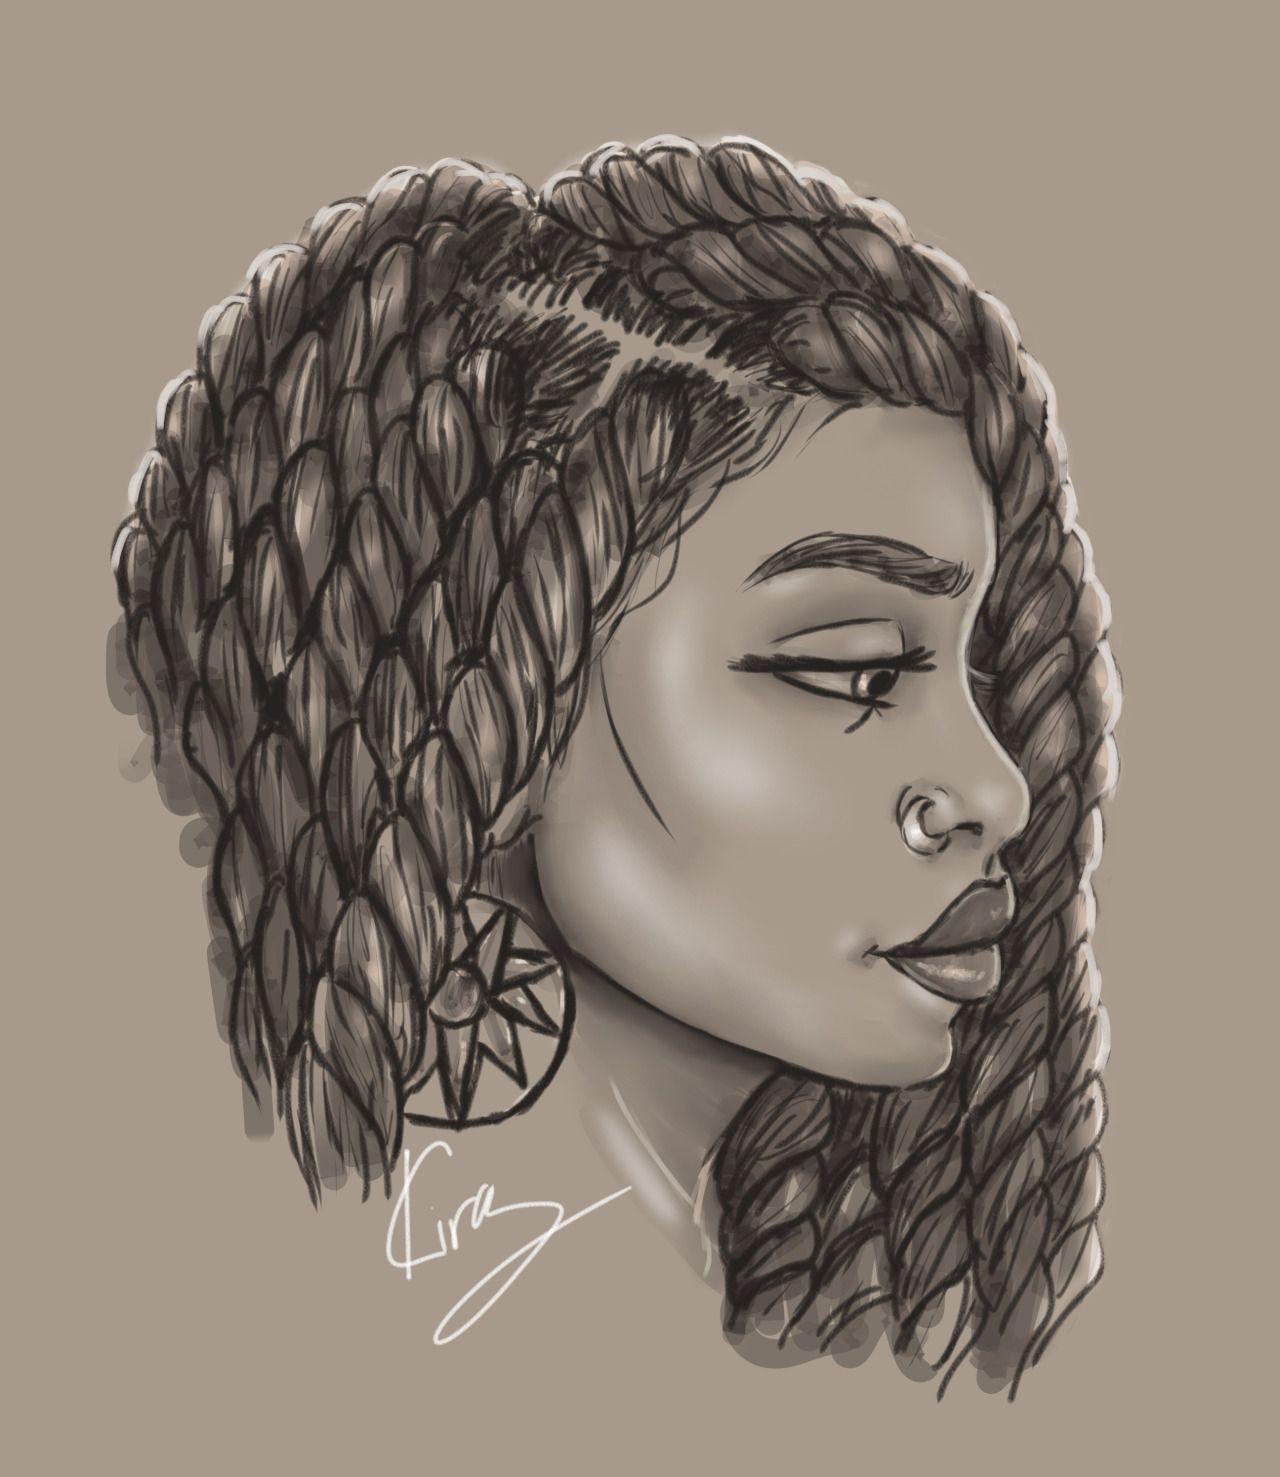 black women art cool drawings